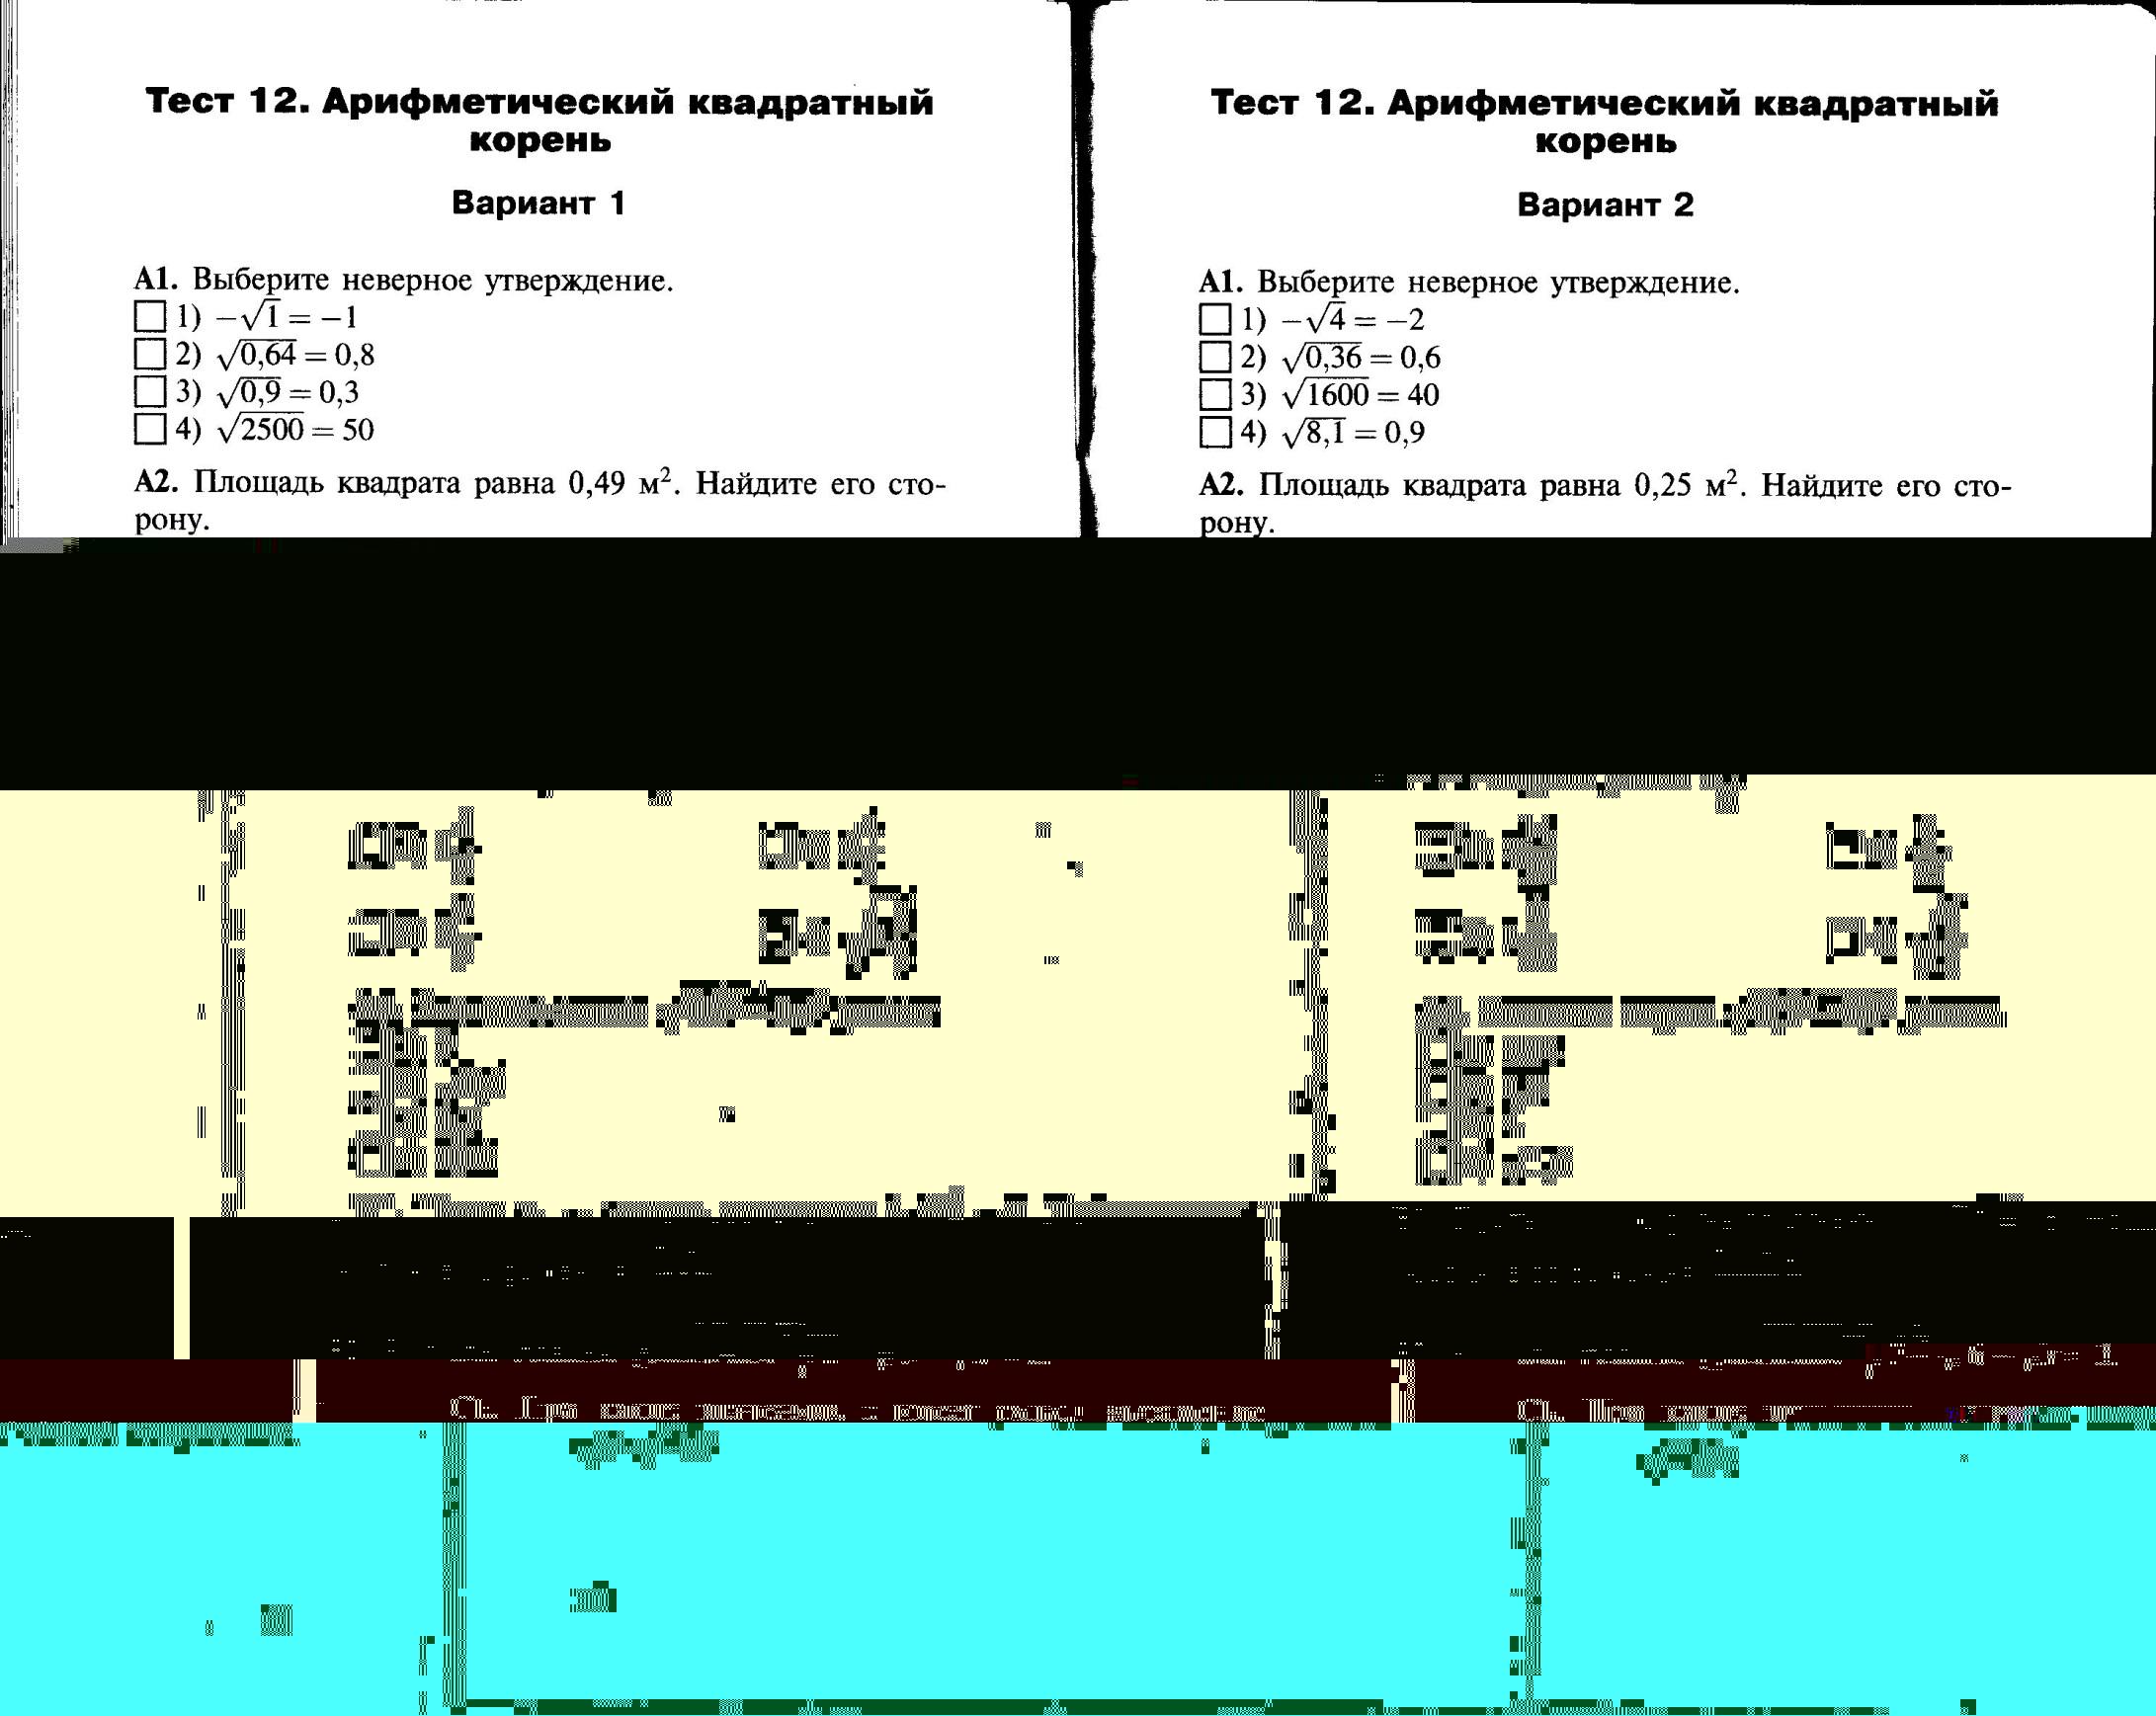 C:\Users\user\Desktop\математика8кл\математика 8класс подготовка к гиа\математика 8класс подготовка к гиа 014.jpg